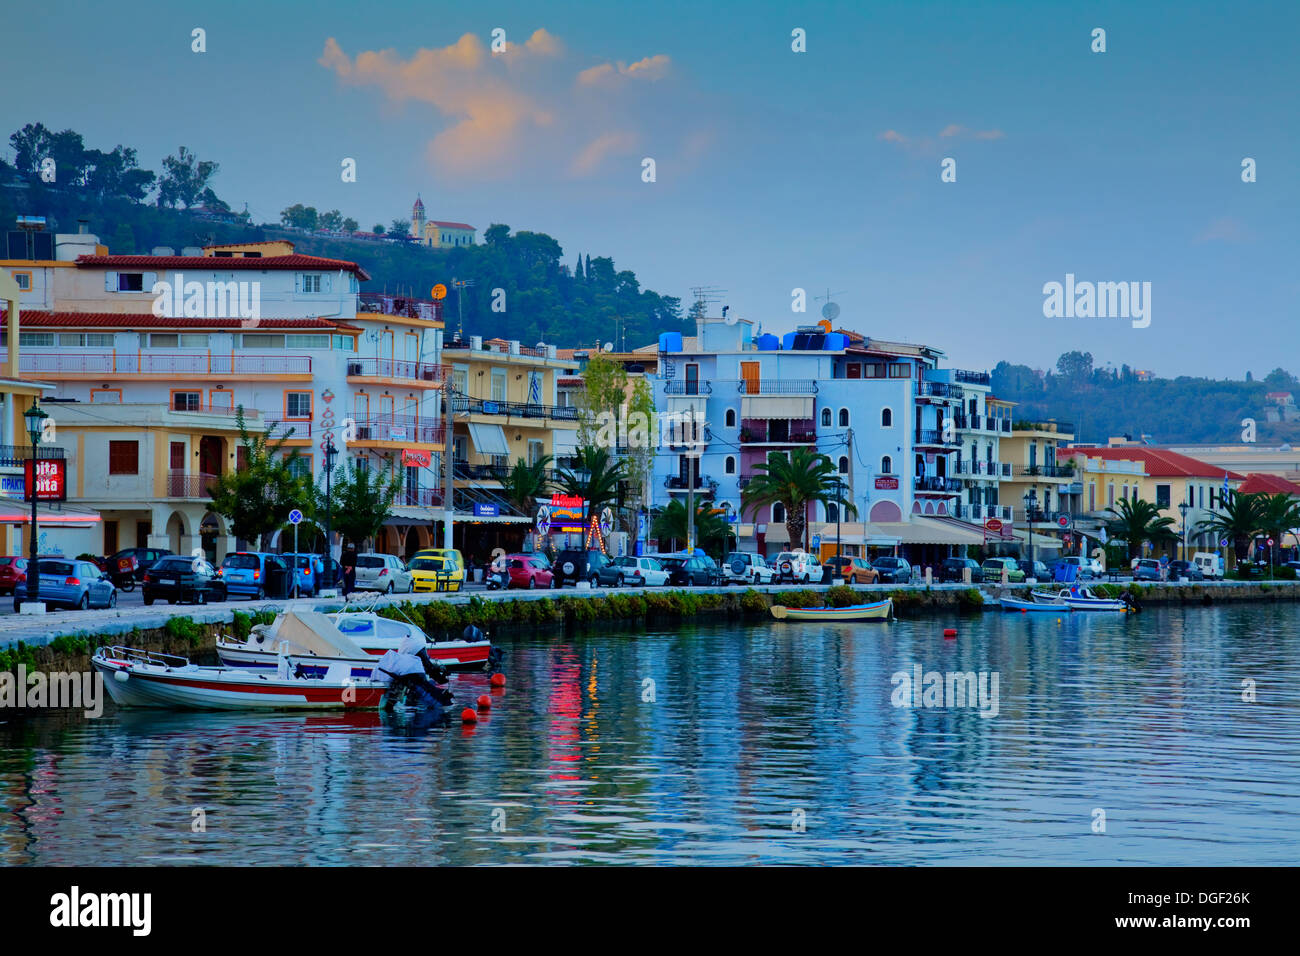 Zakynthos Town, Zakynthos (Zante), Greece - Stock Image